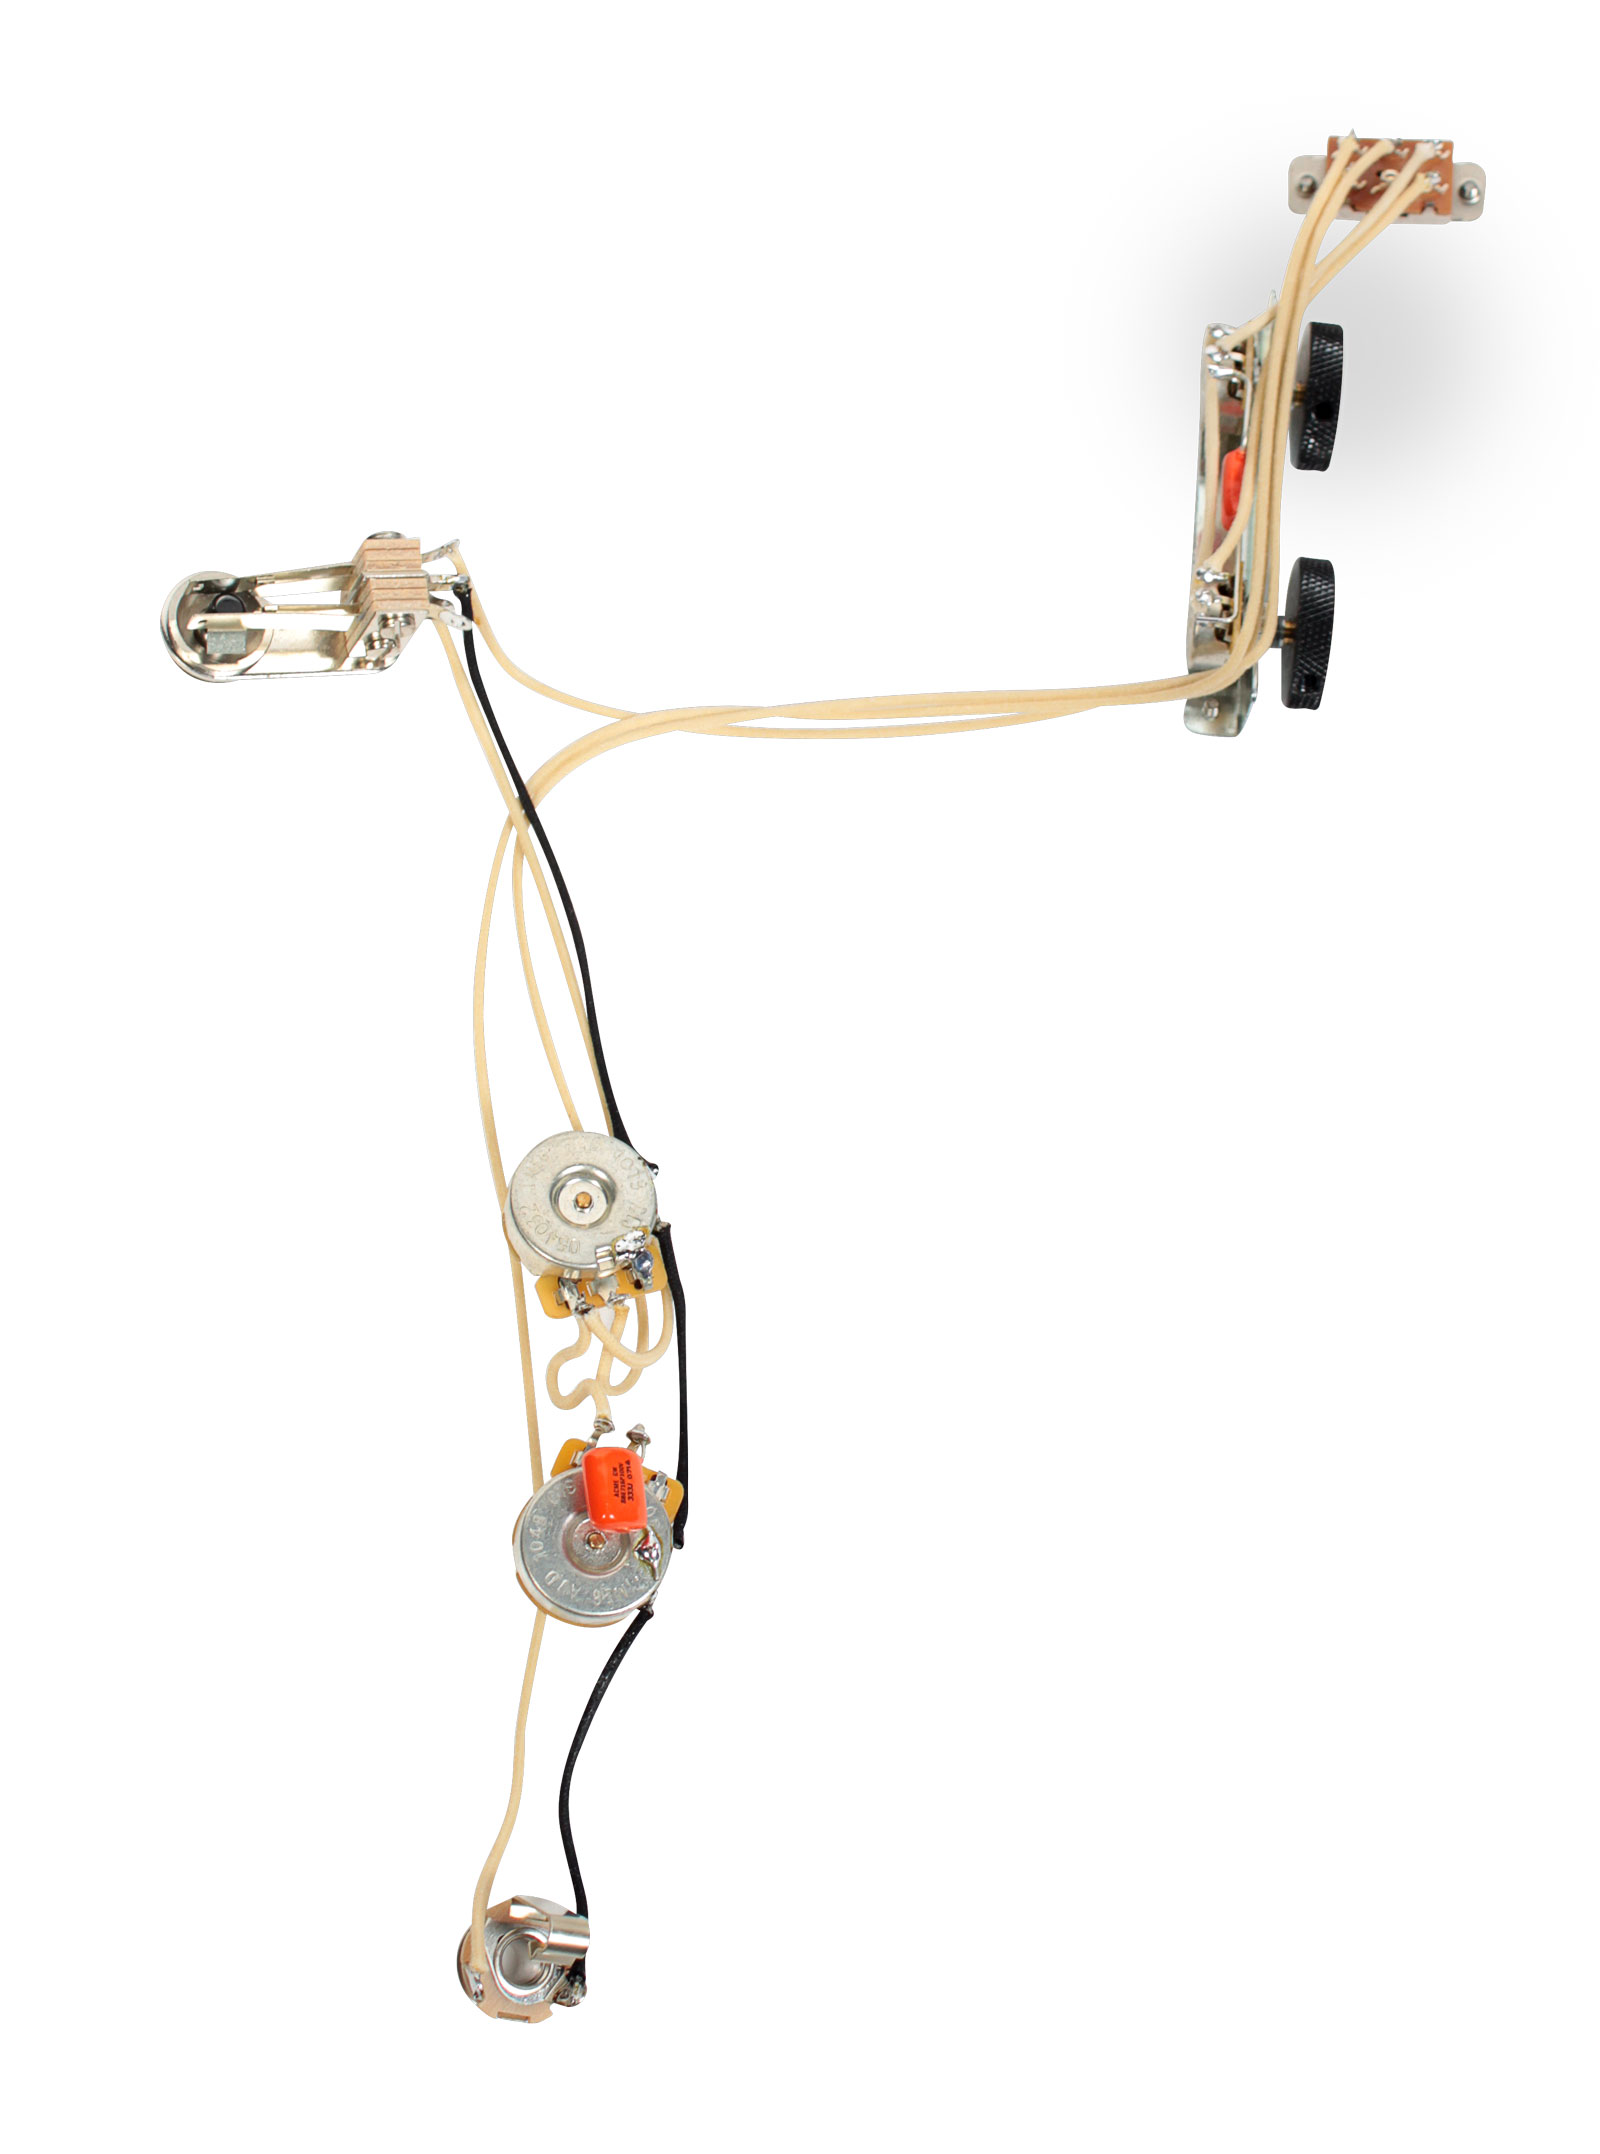 fender mustang pickup wiring diagram les paul jr p90 jazzmaster free engine image